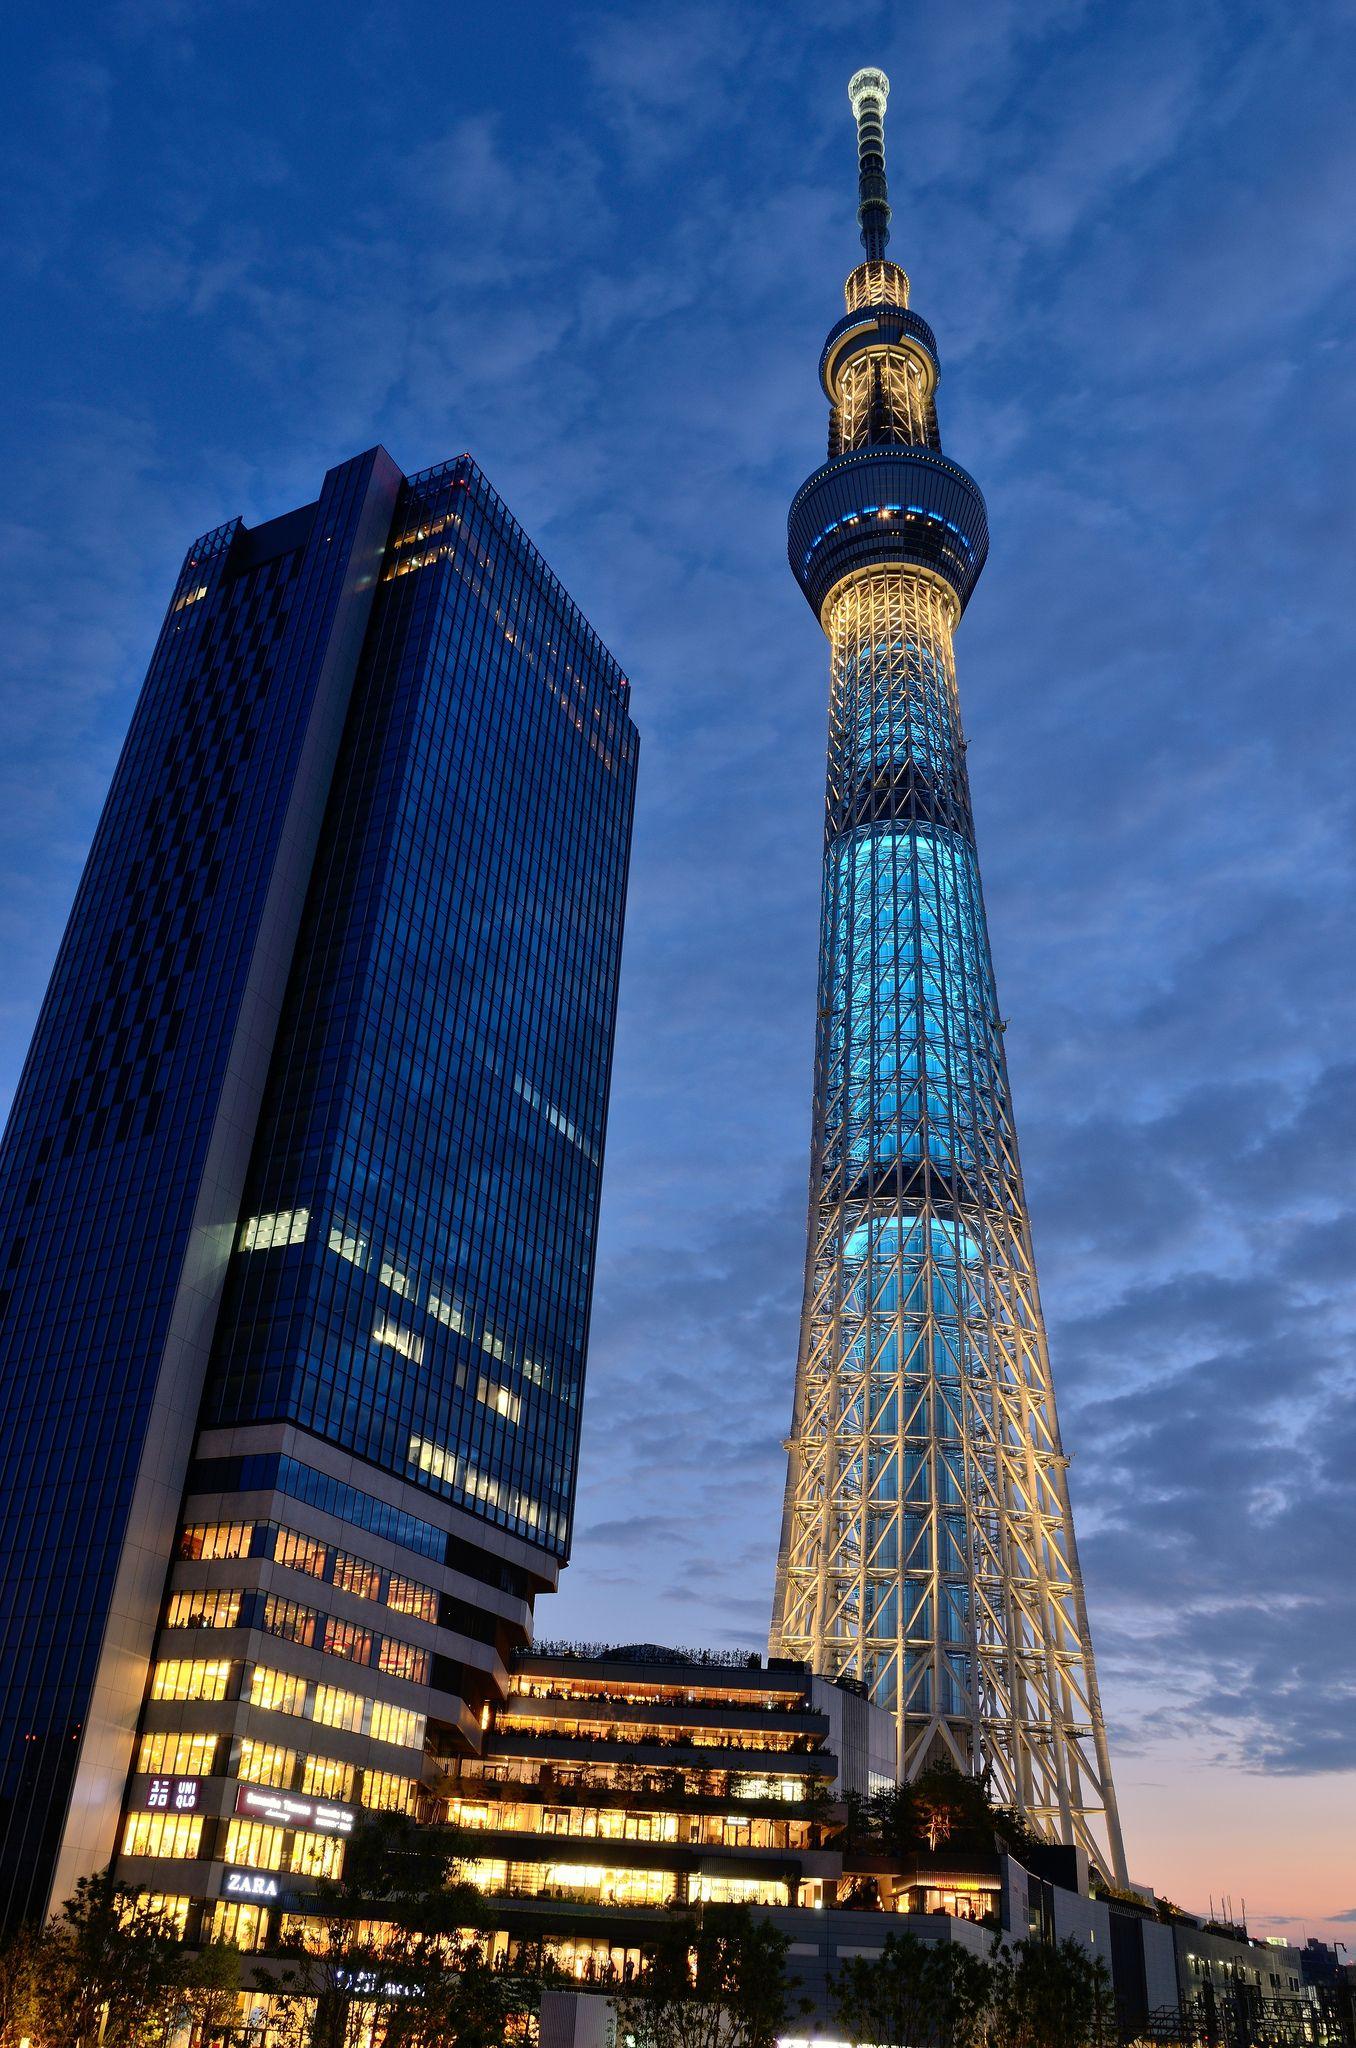 Tokyo Sky Tree 東京スカイツリー 2020 夜景 壁紙 トラベル